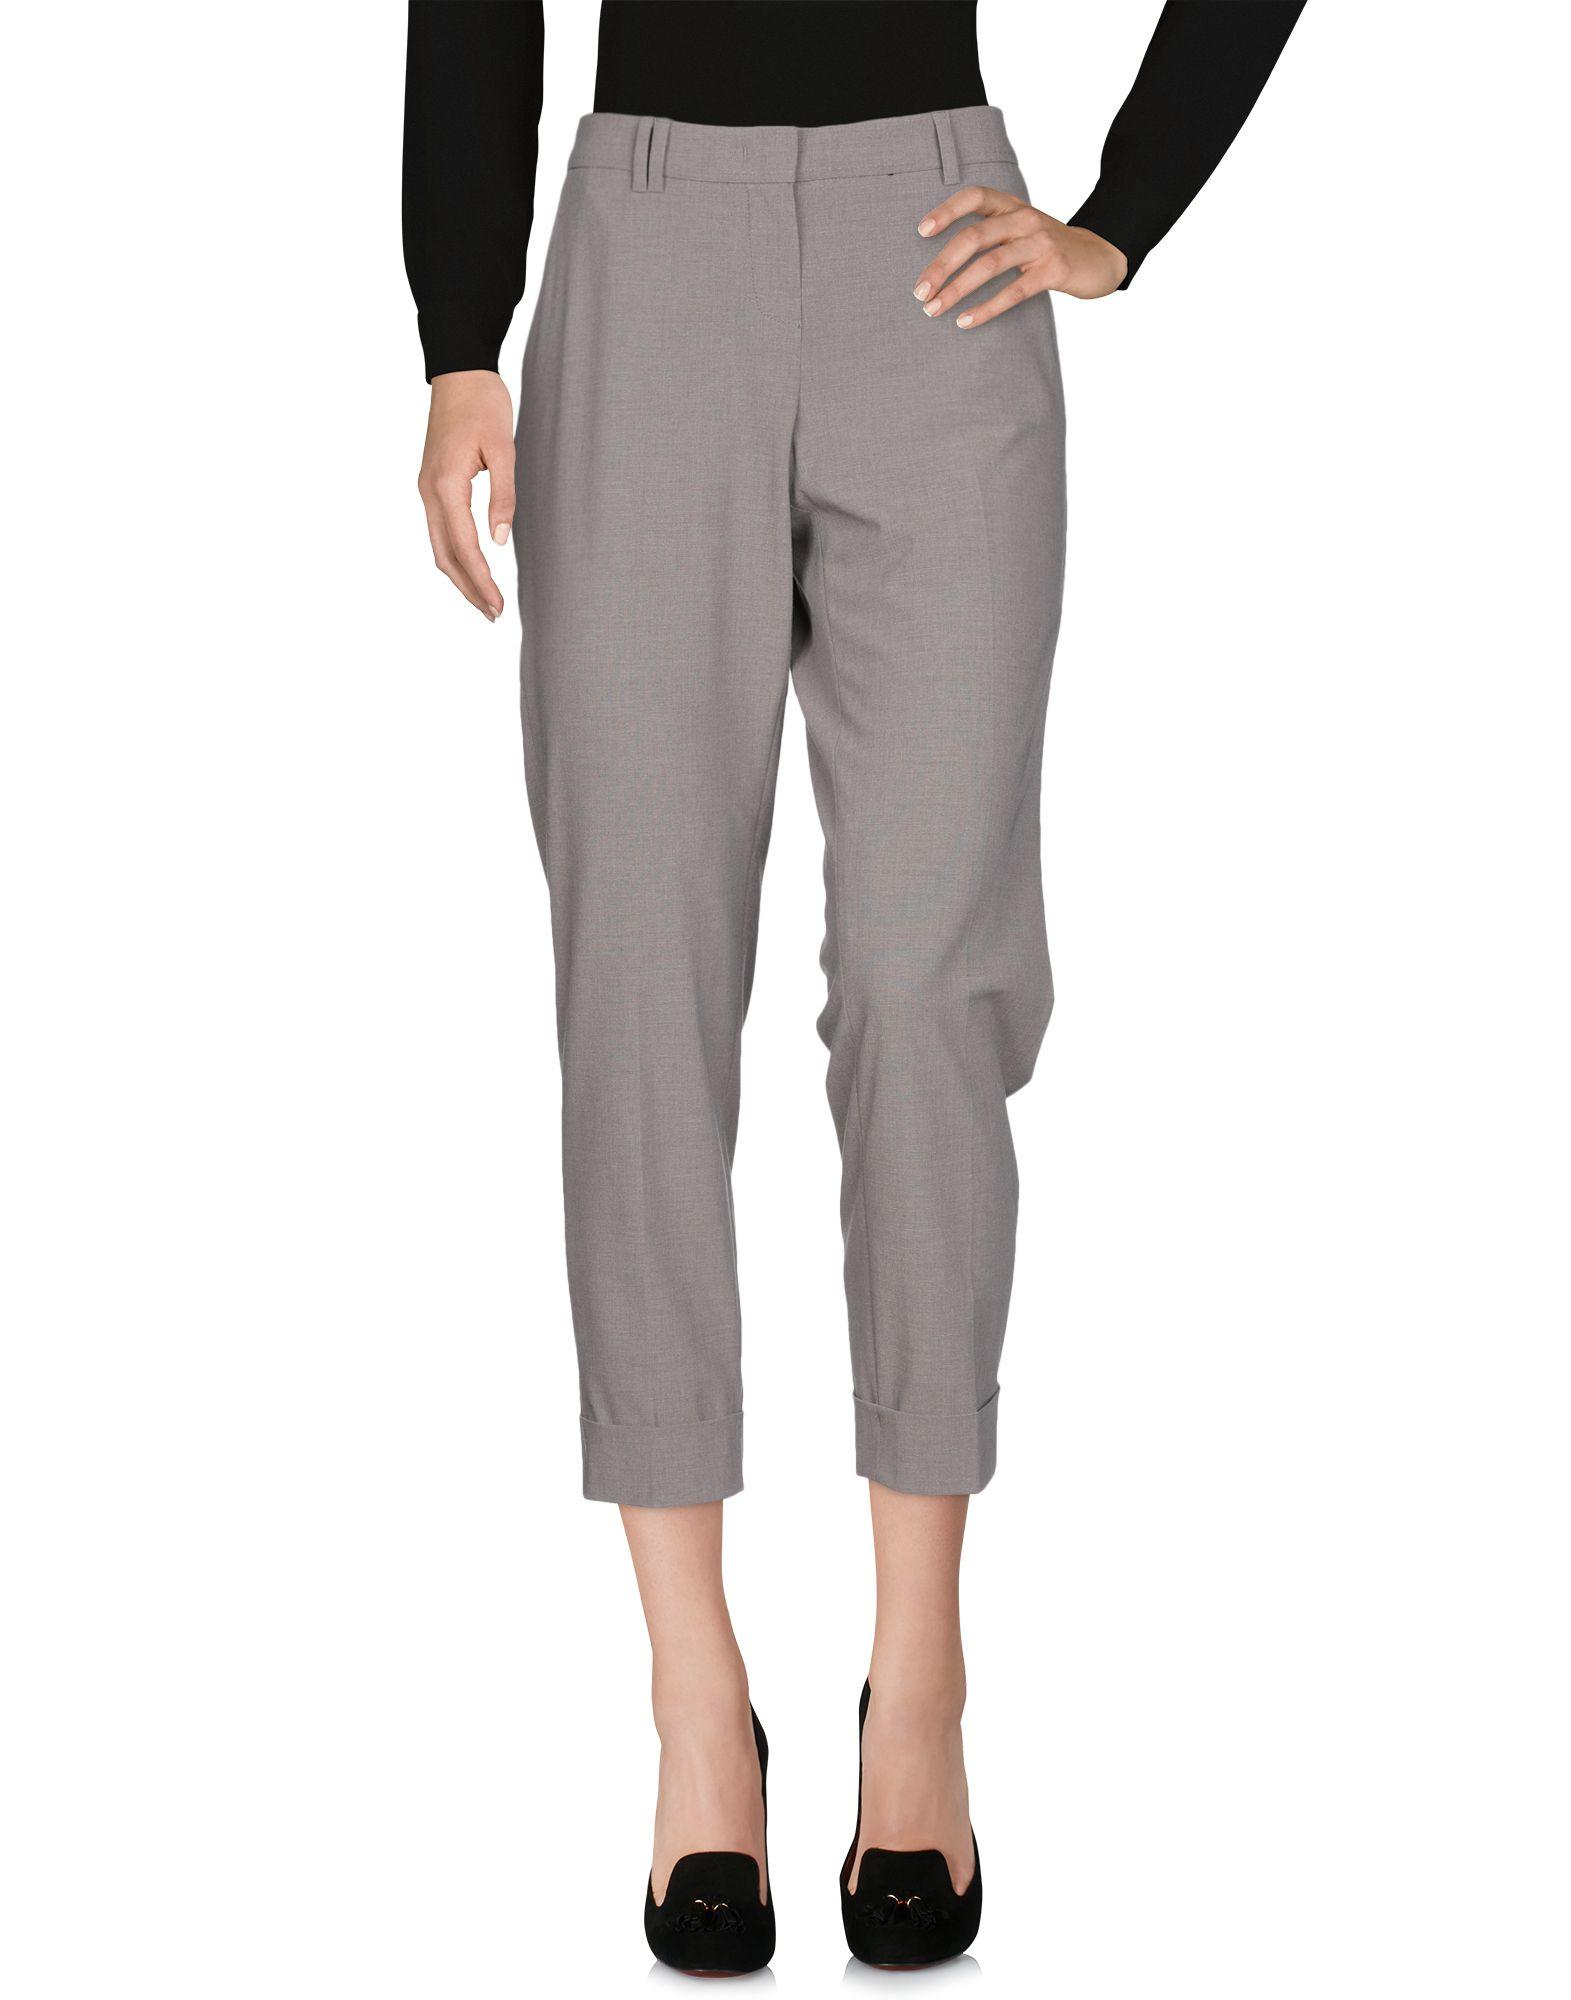 SEDUCTIVE Casual Pants in Dove Grey